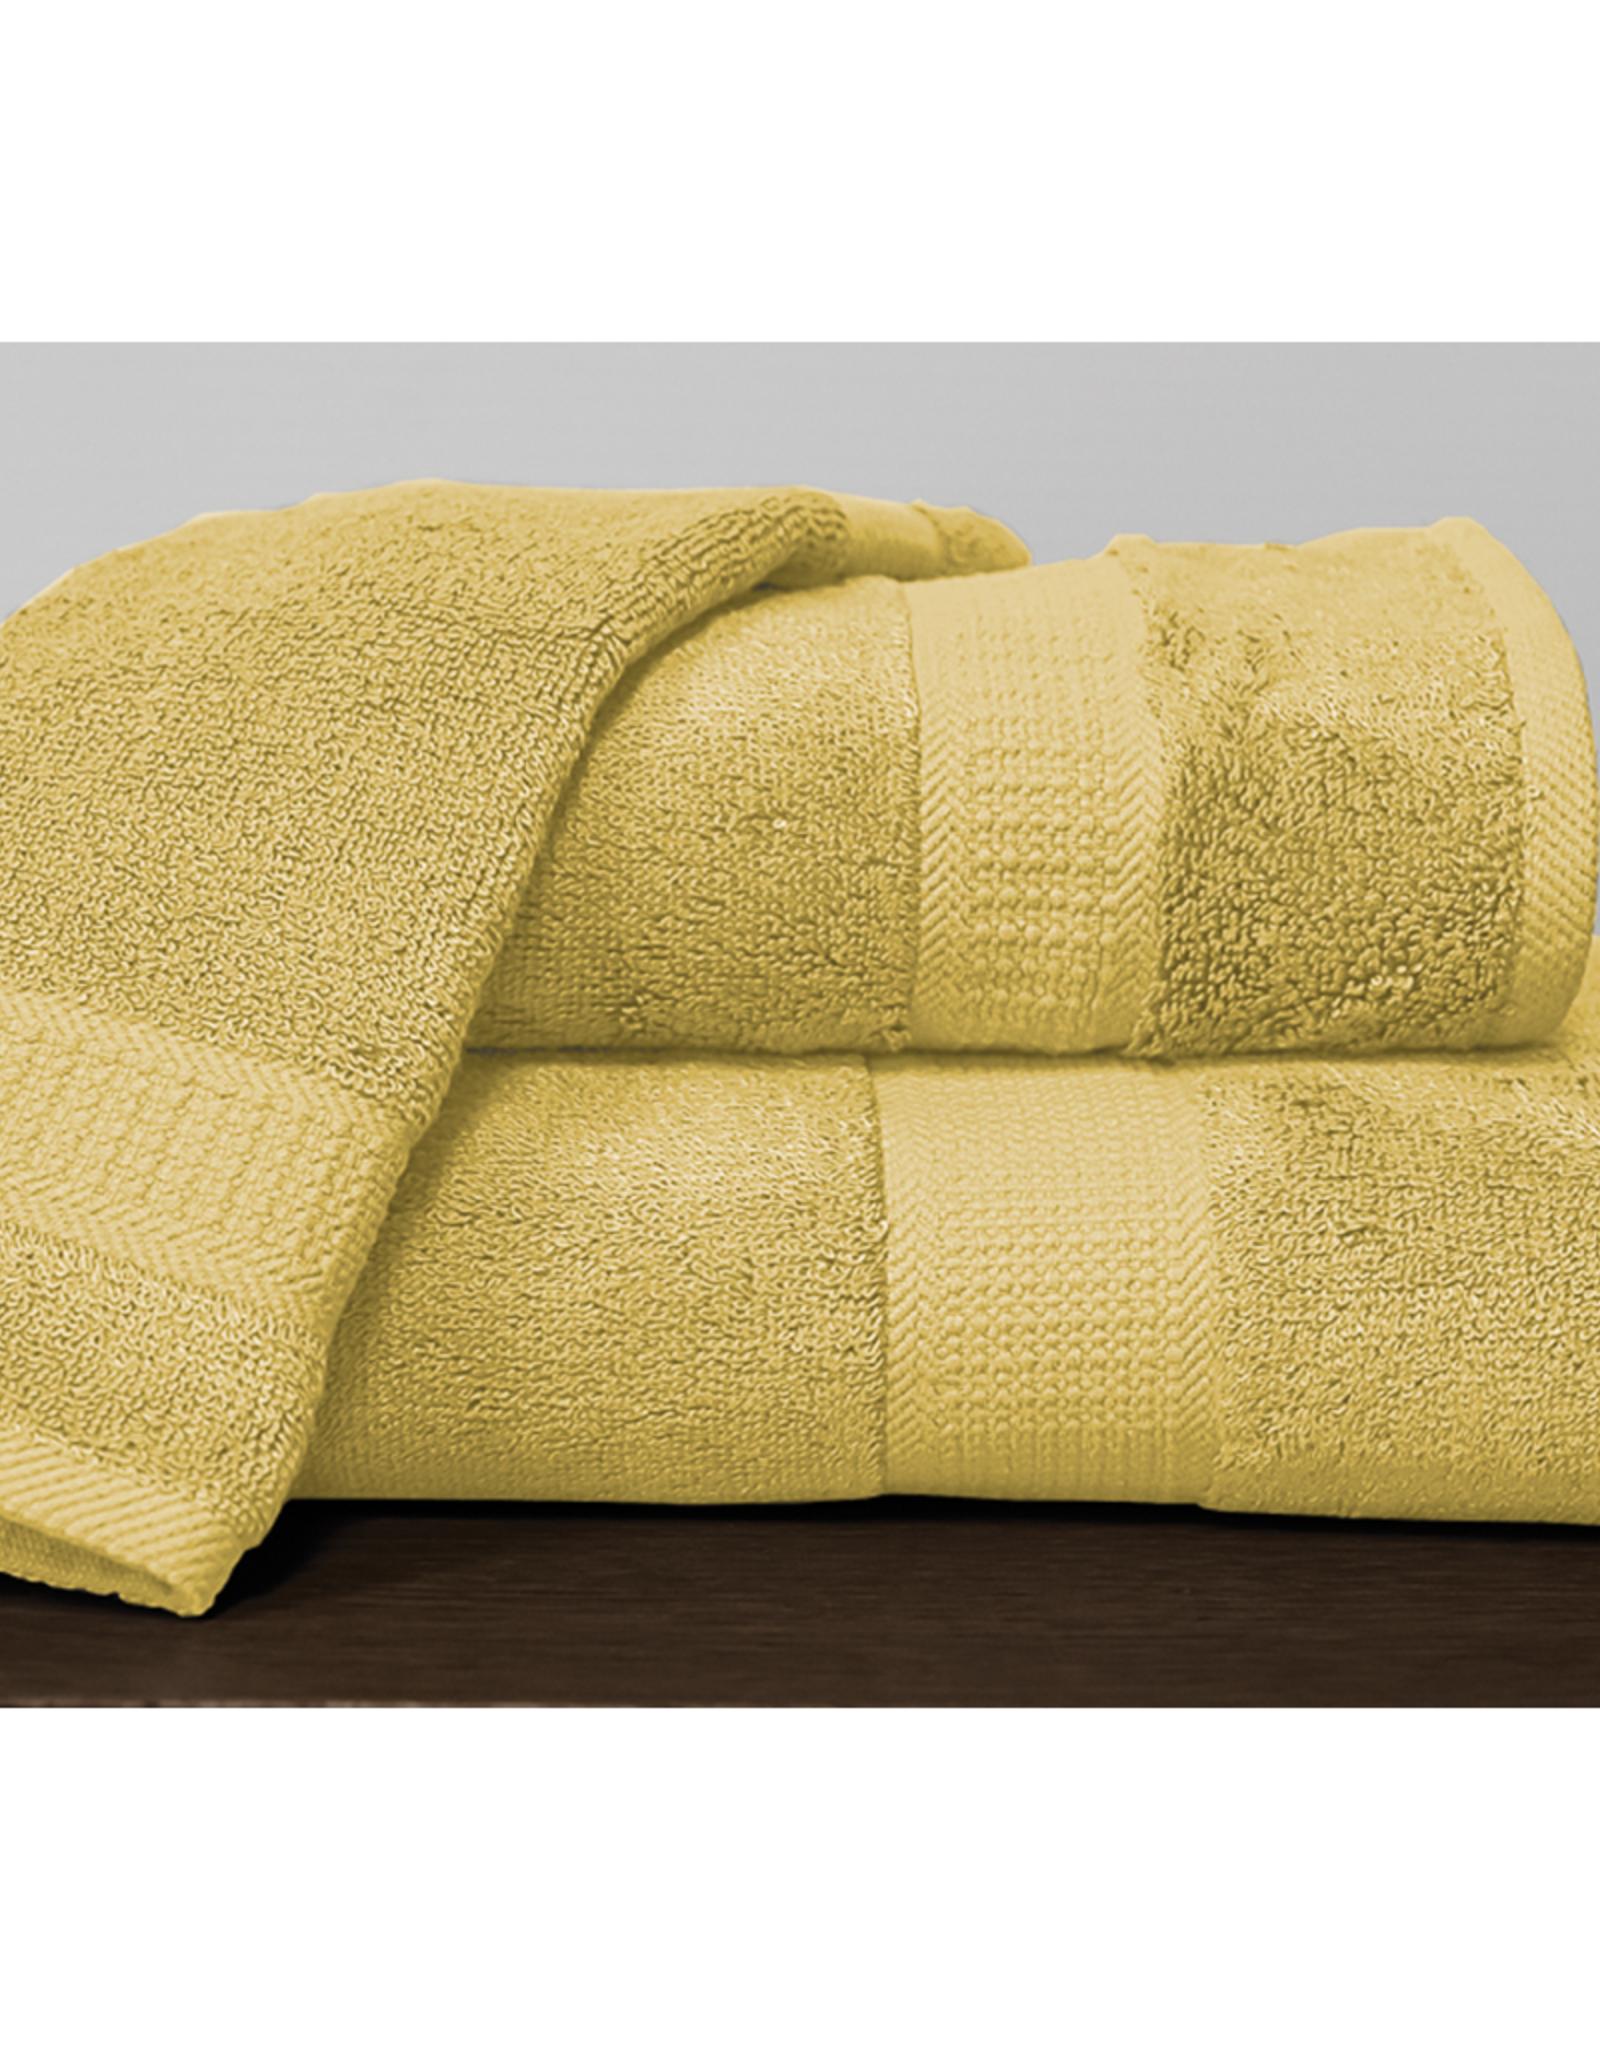 Alamode Home Bath Sheet RJS Bamboo Butter Yellow